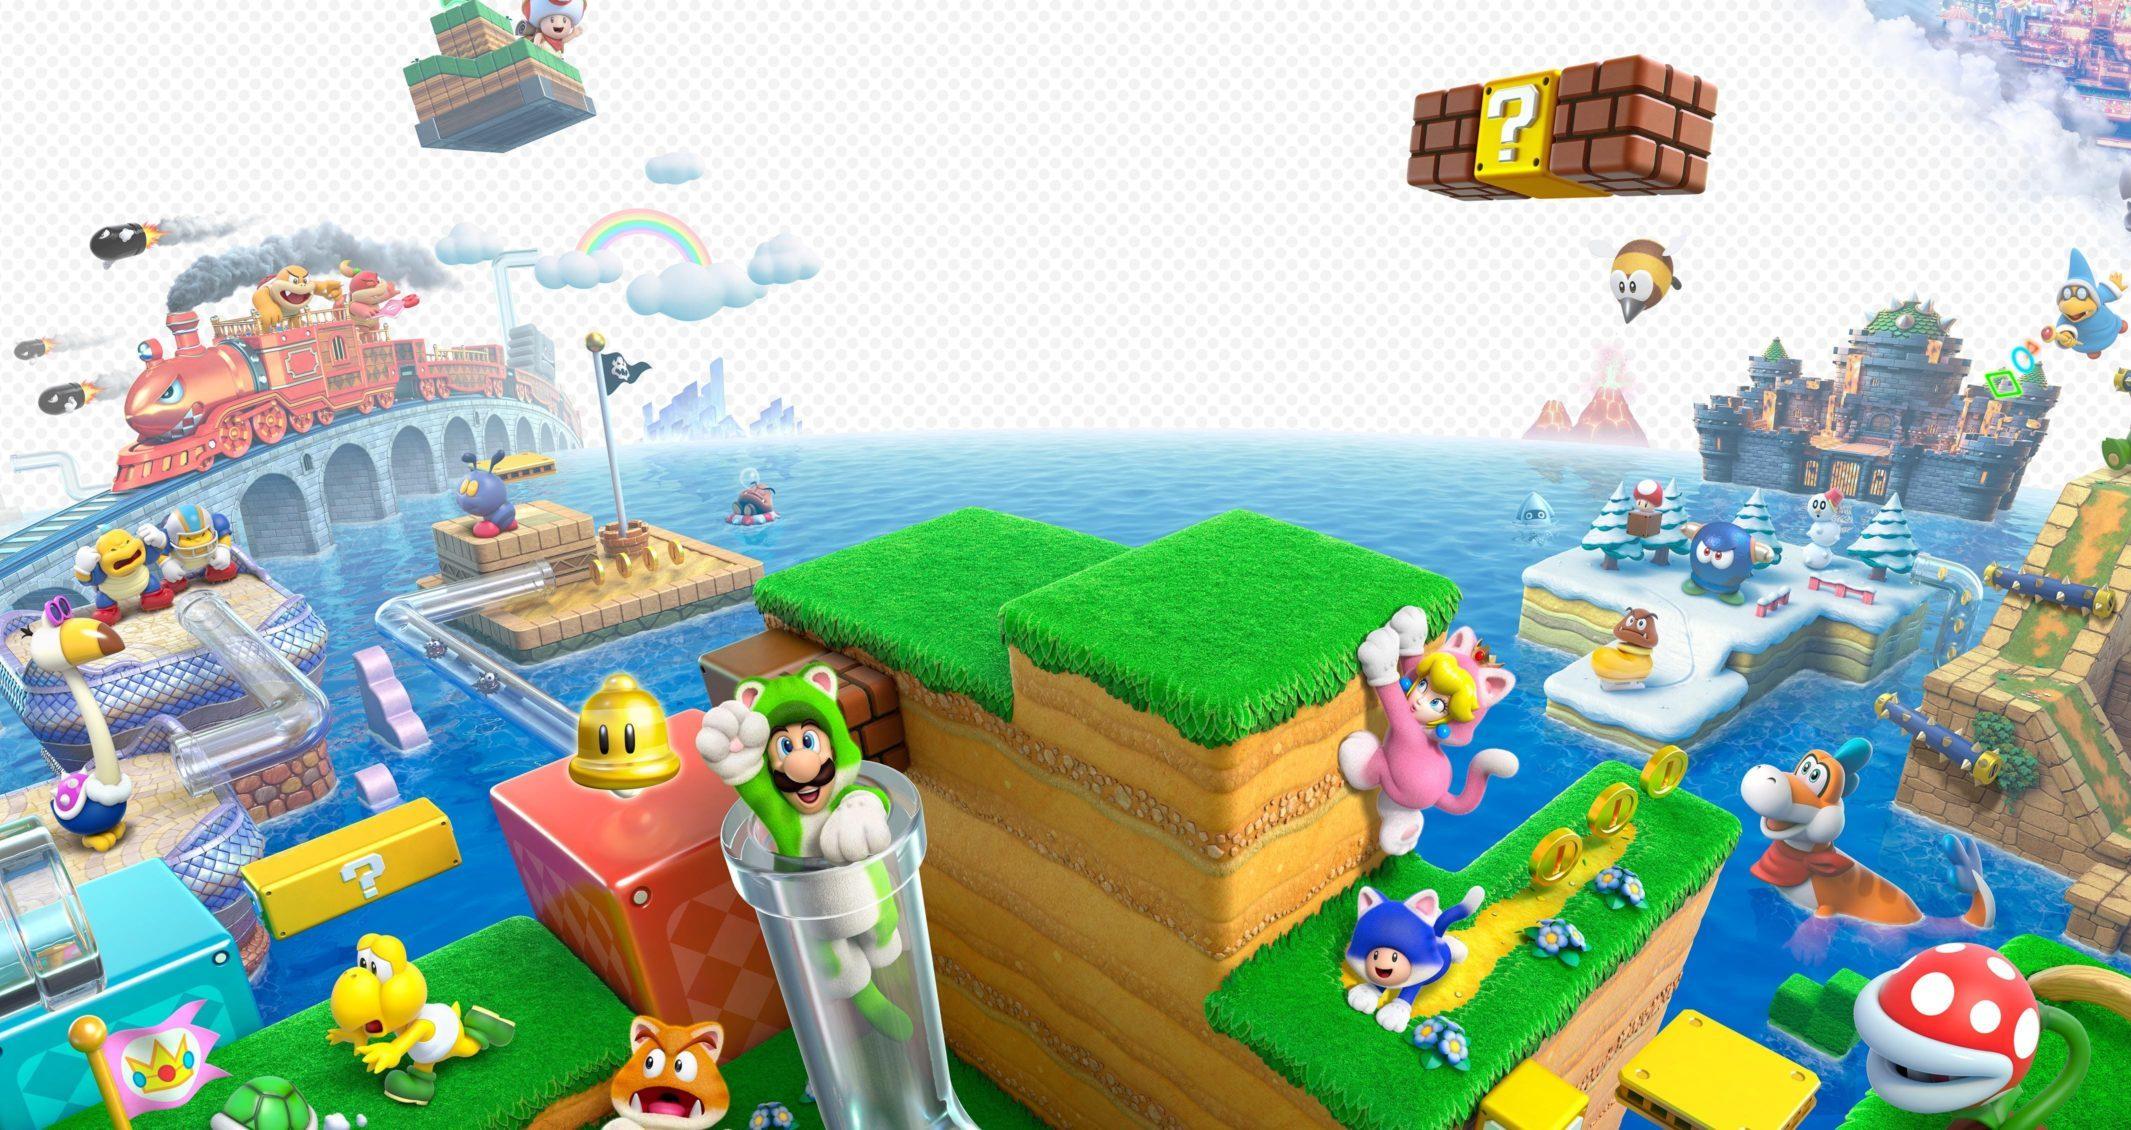 Super Mario 3D World Nintendo Switch